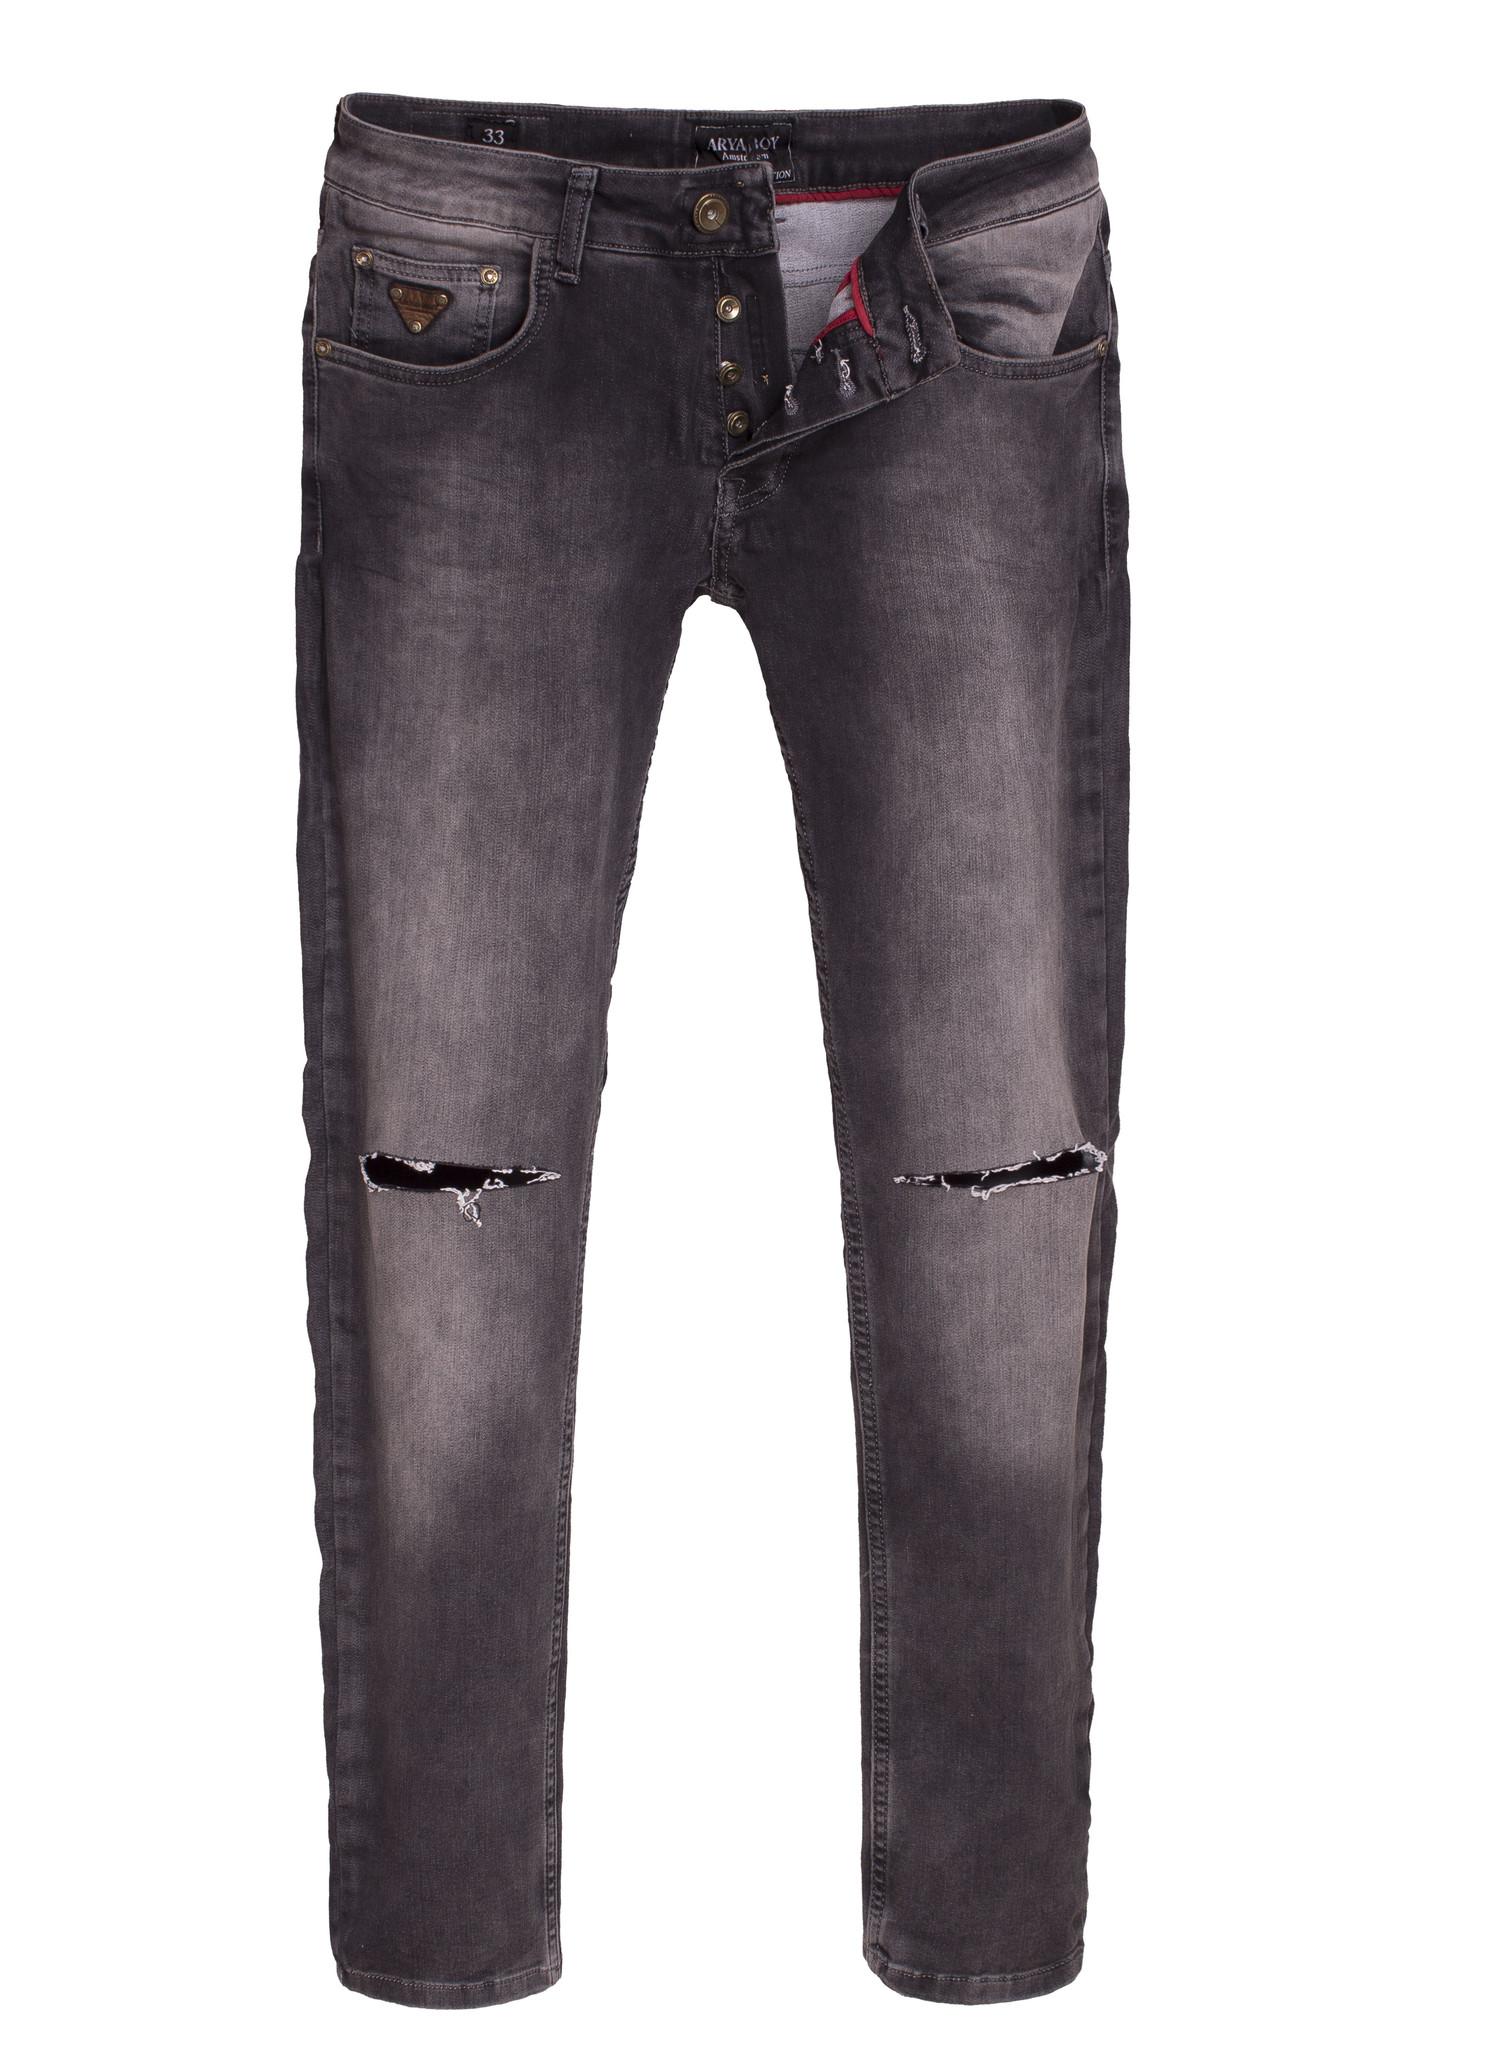 Arya Boy Jeans 82020 Steel Grey